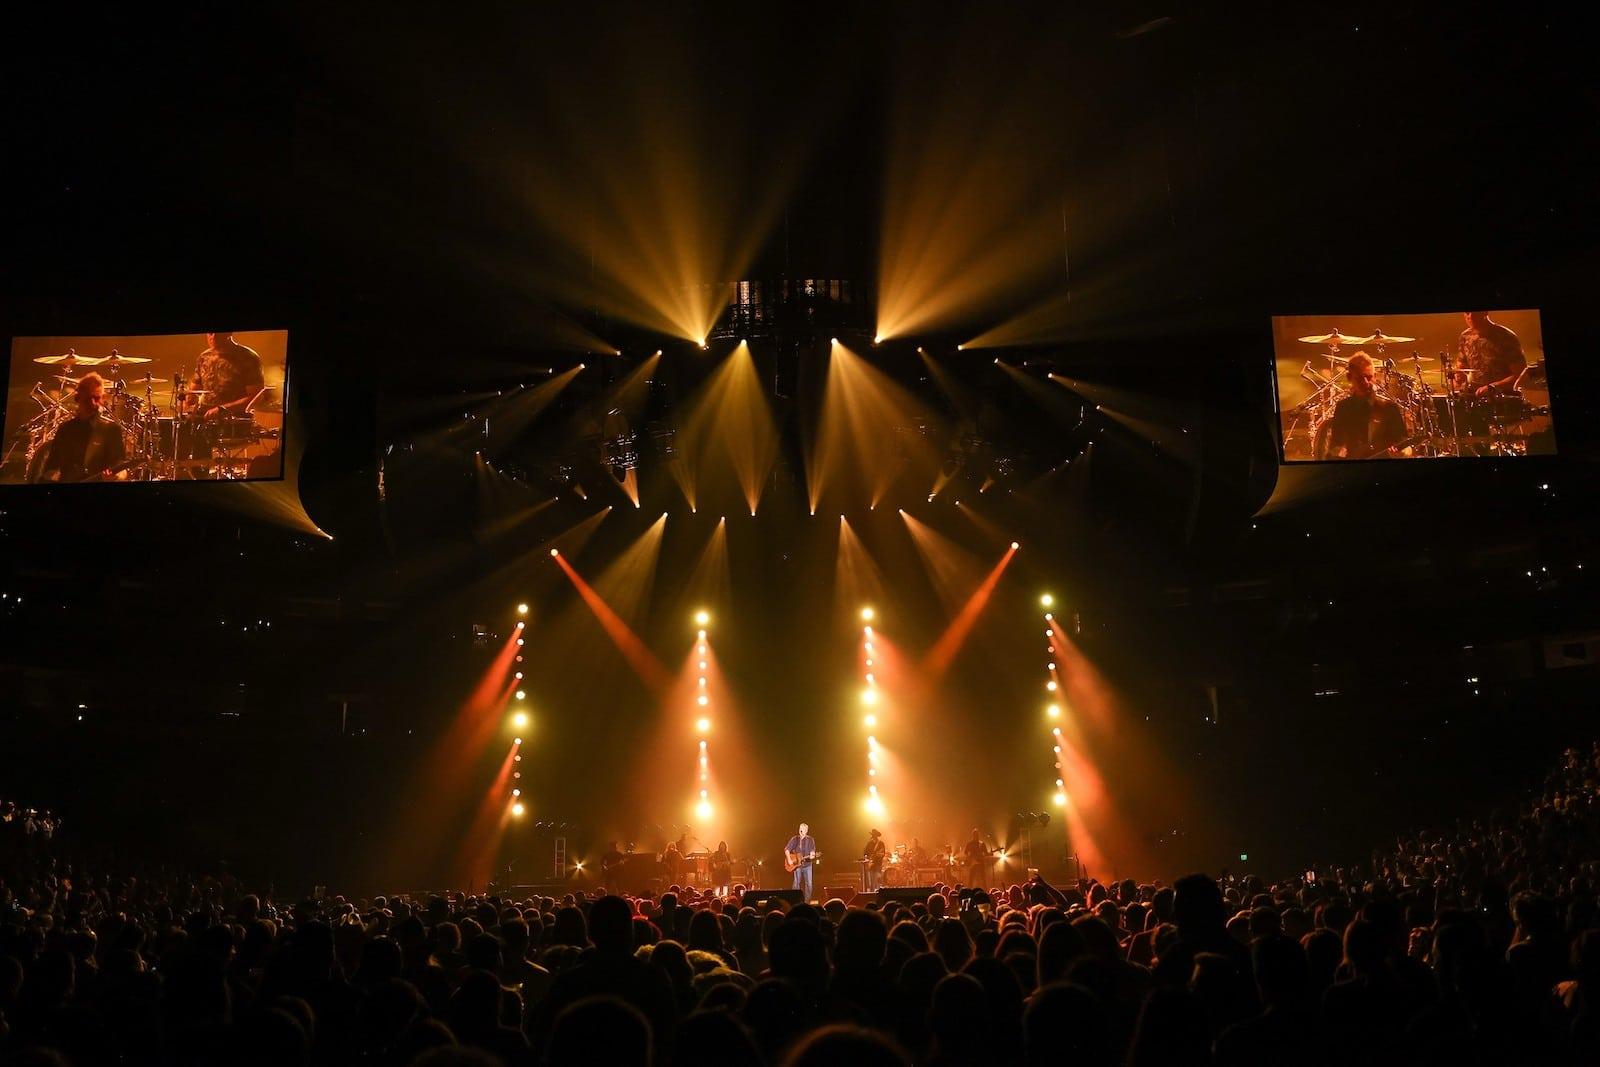 Image of a concert at Ball Arena in Denver, Colorado